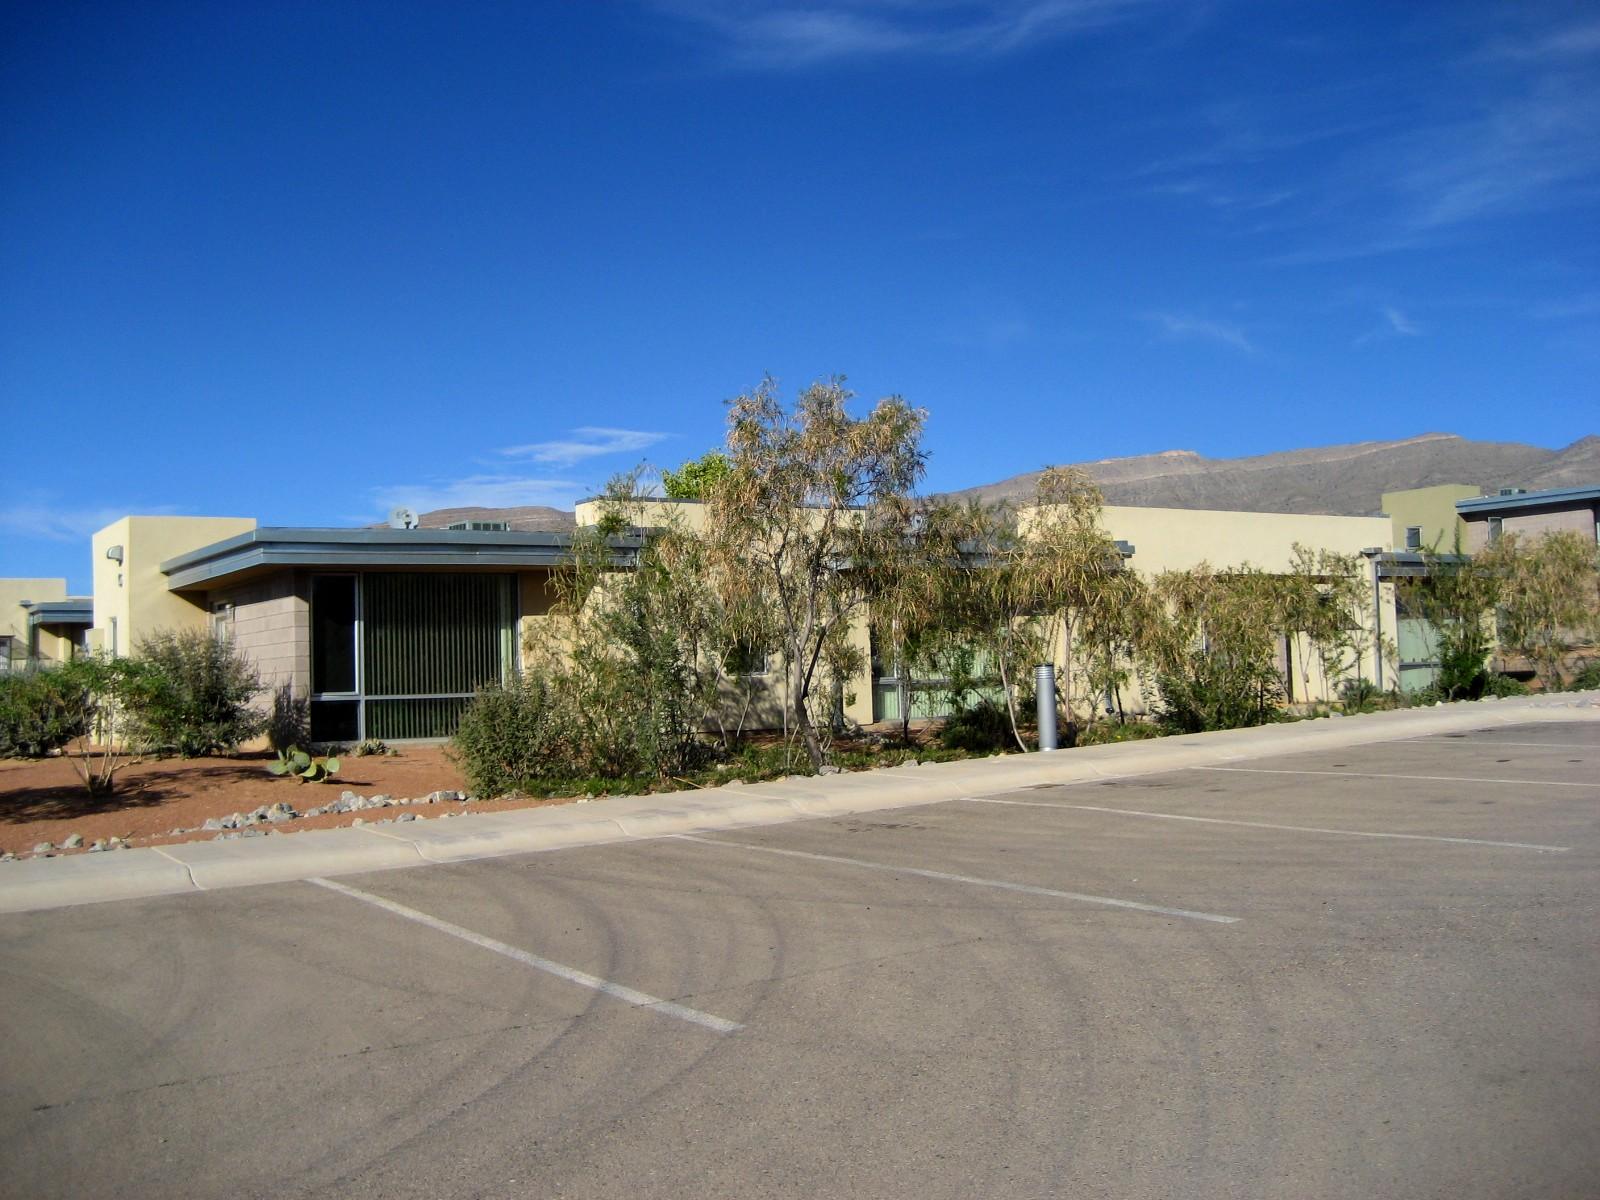 Living Rootless: New Mexico: Architecture 1: Alamogordo ...